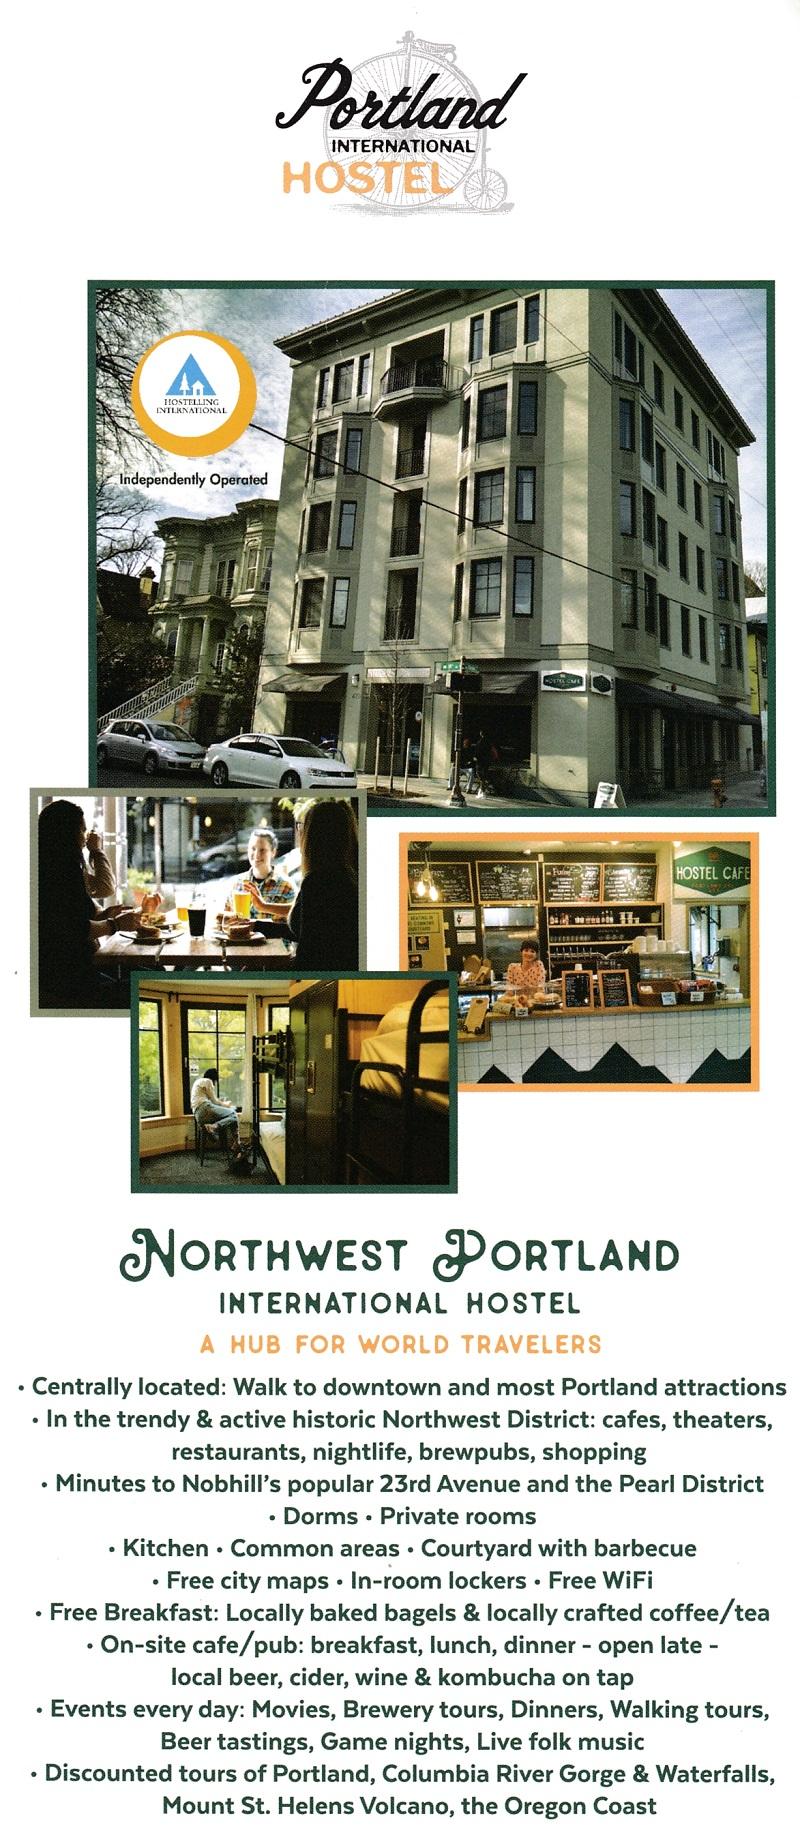 NW Portland International Host